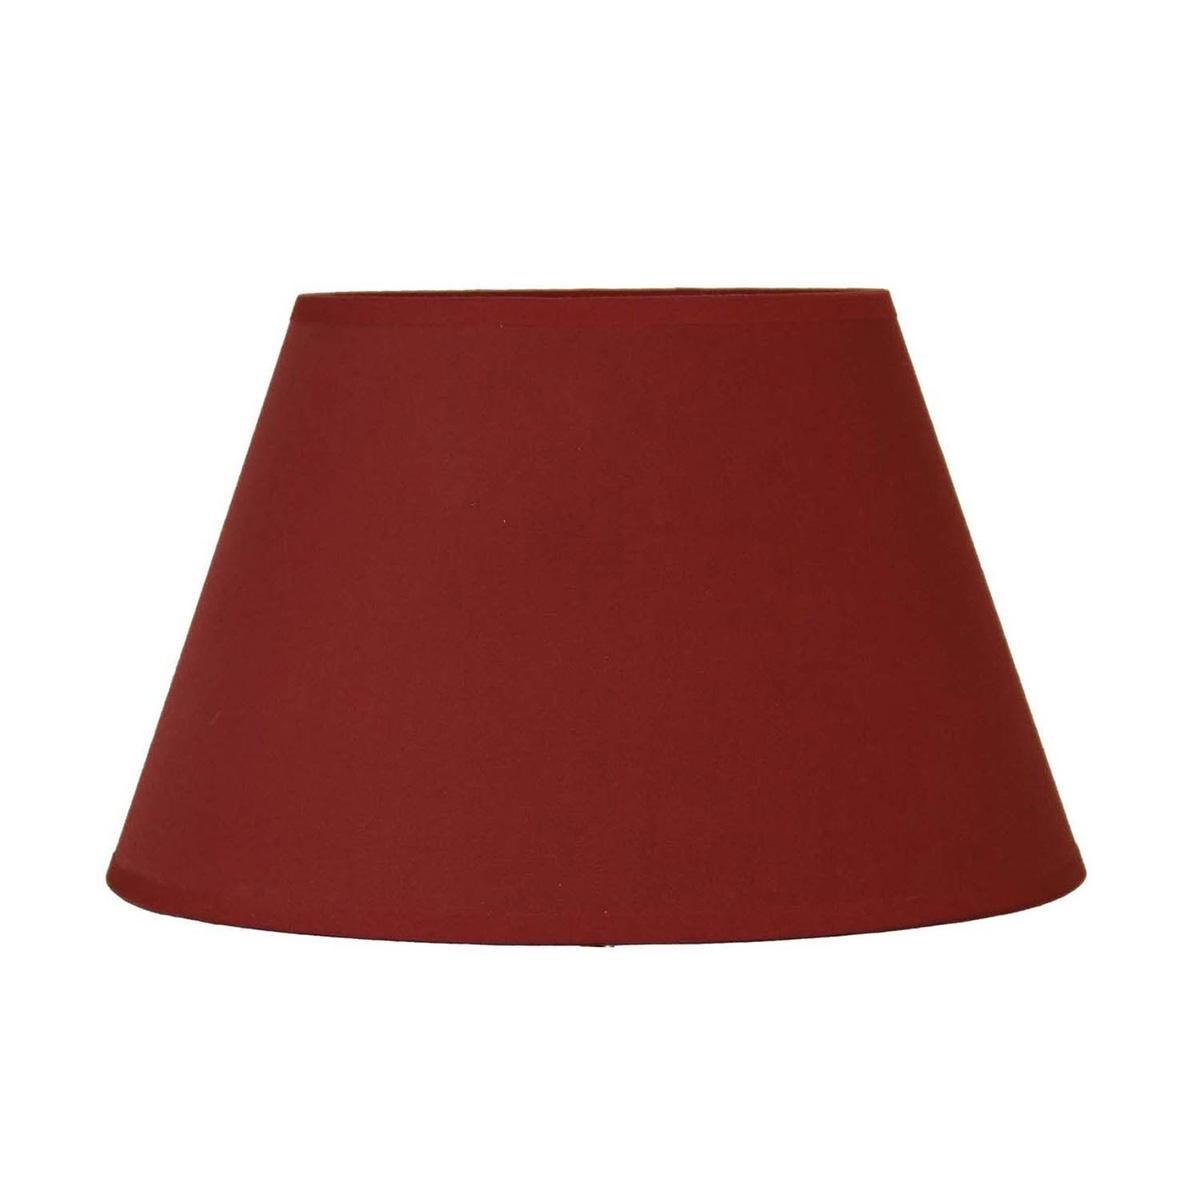 Абажур Lamplandia 7812-2 standard chili red